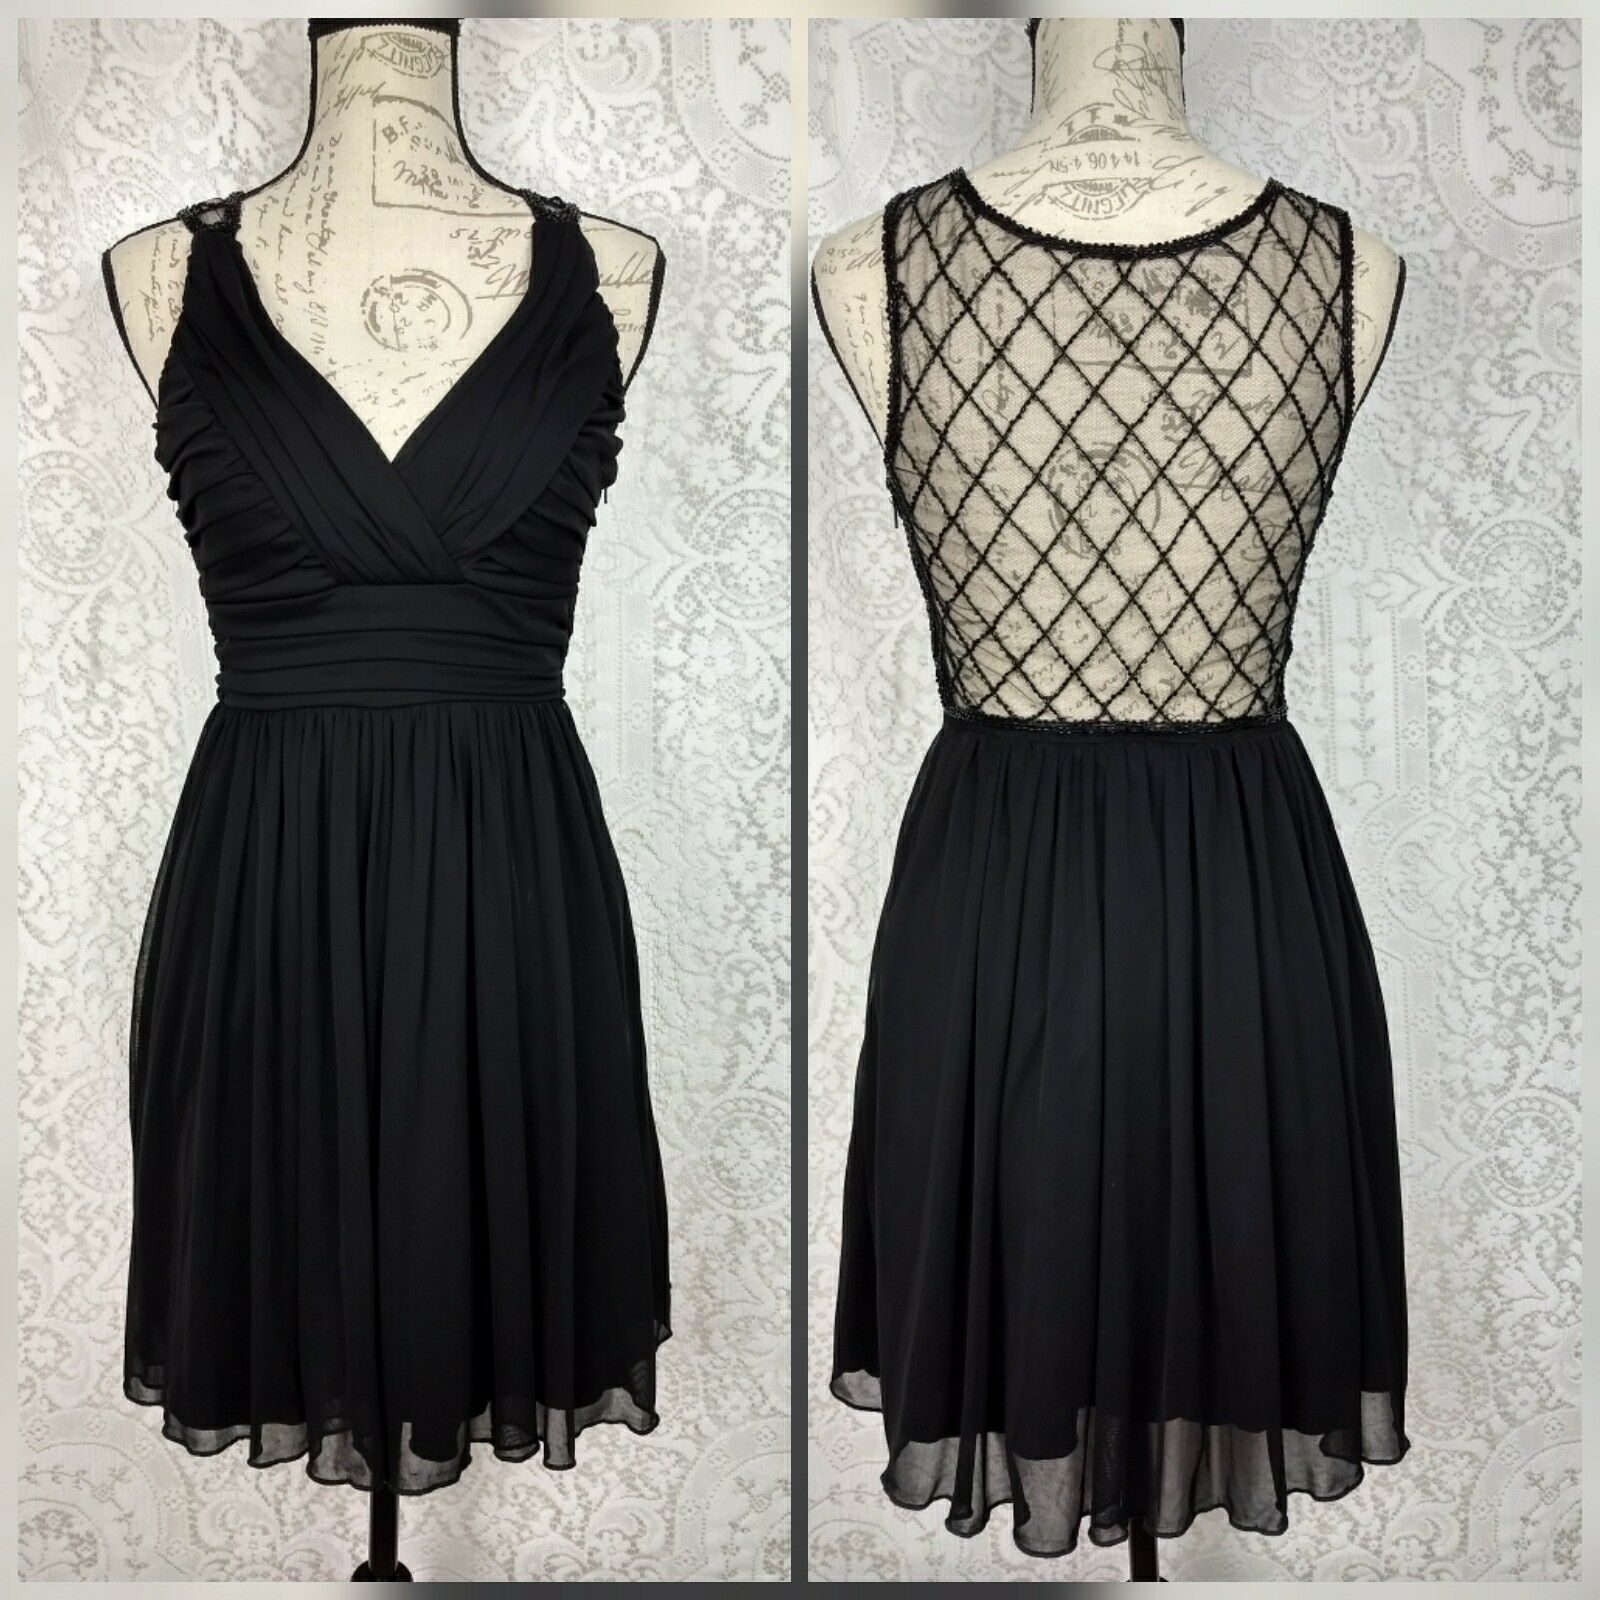 City Triangles damen Little schwarz Cocktail Dress Jr Größe 5 Illusion Beaded Back